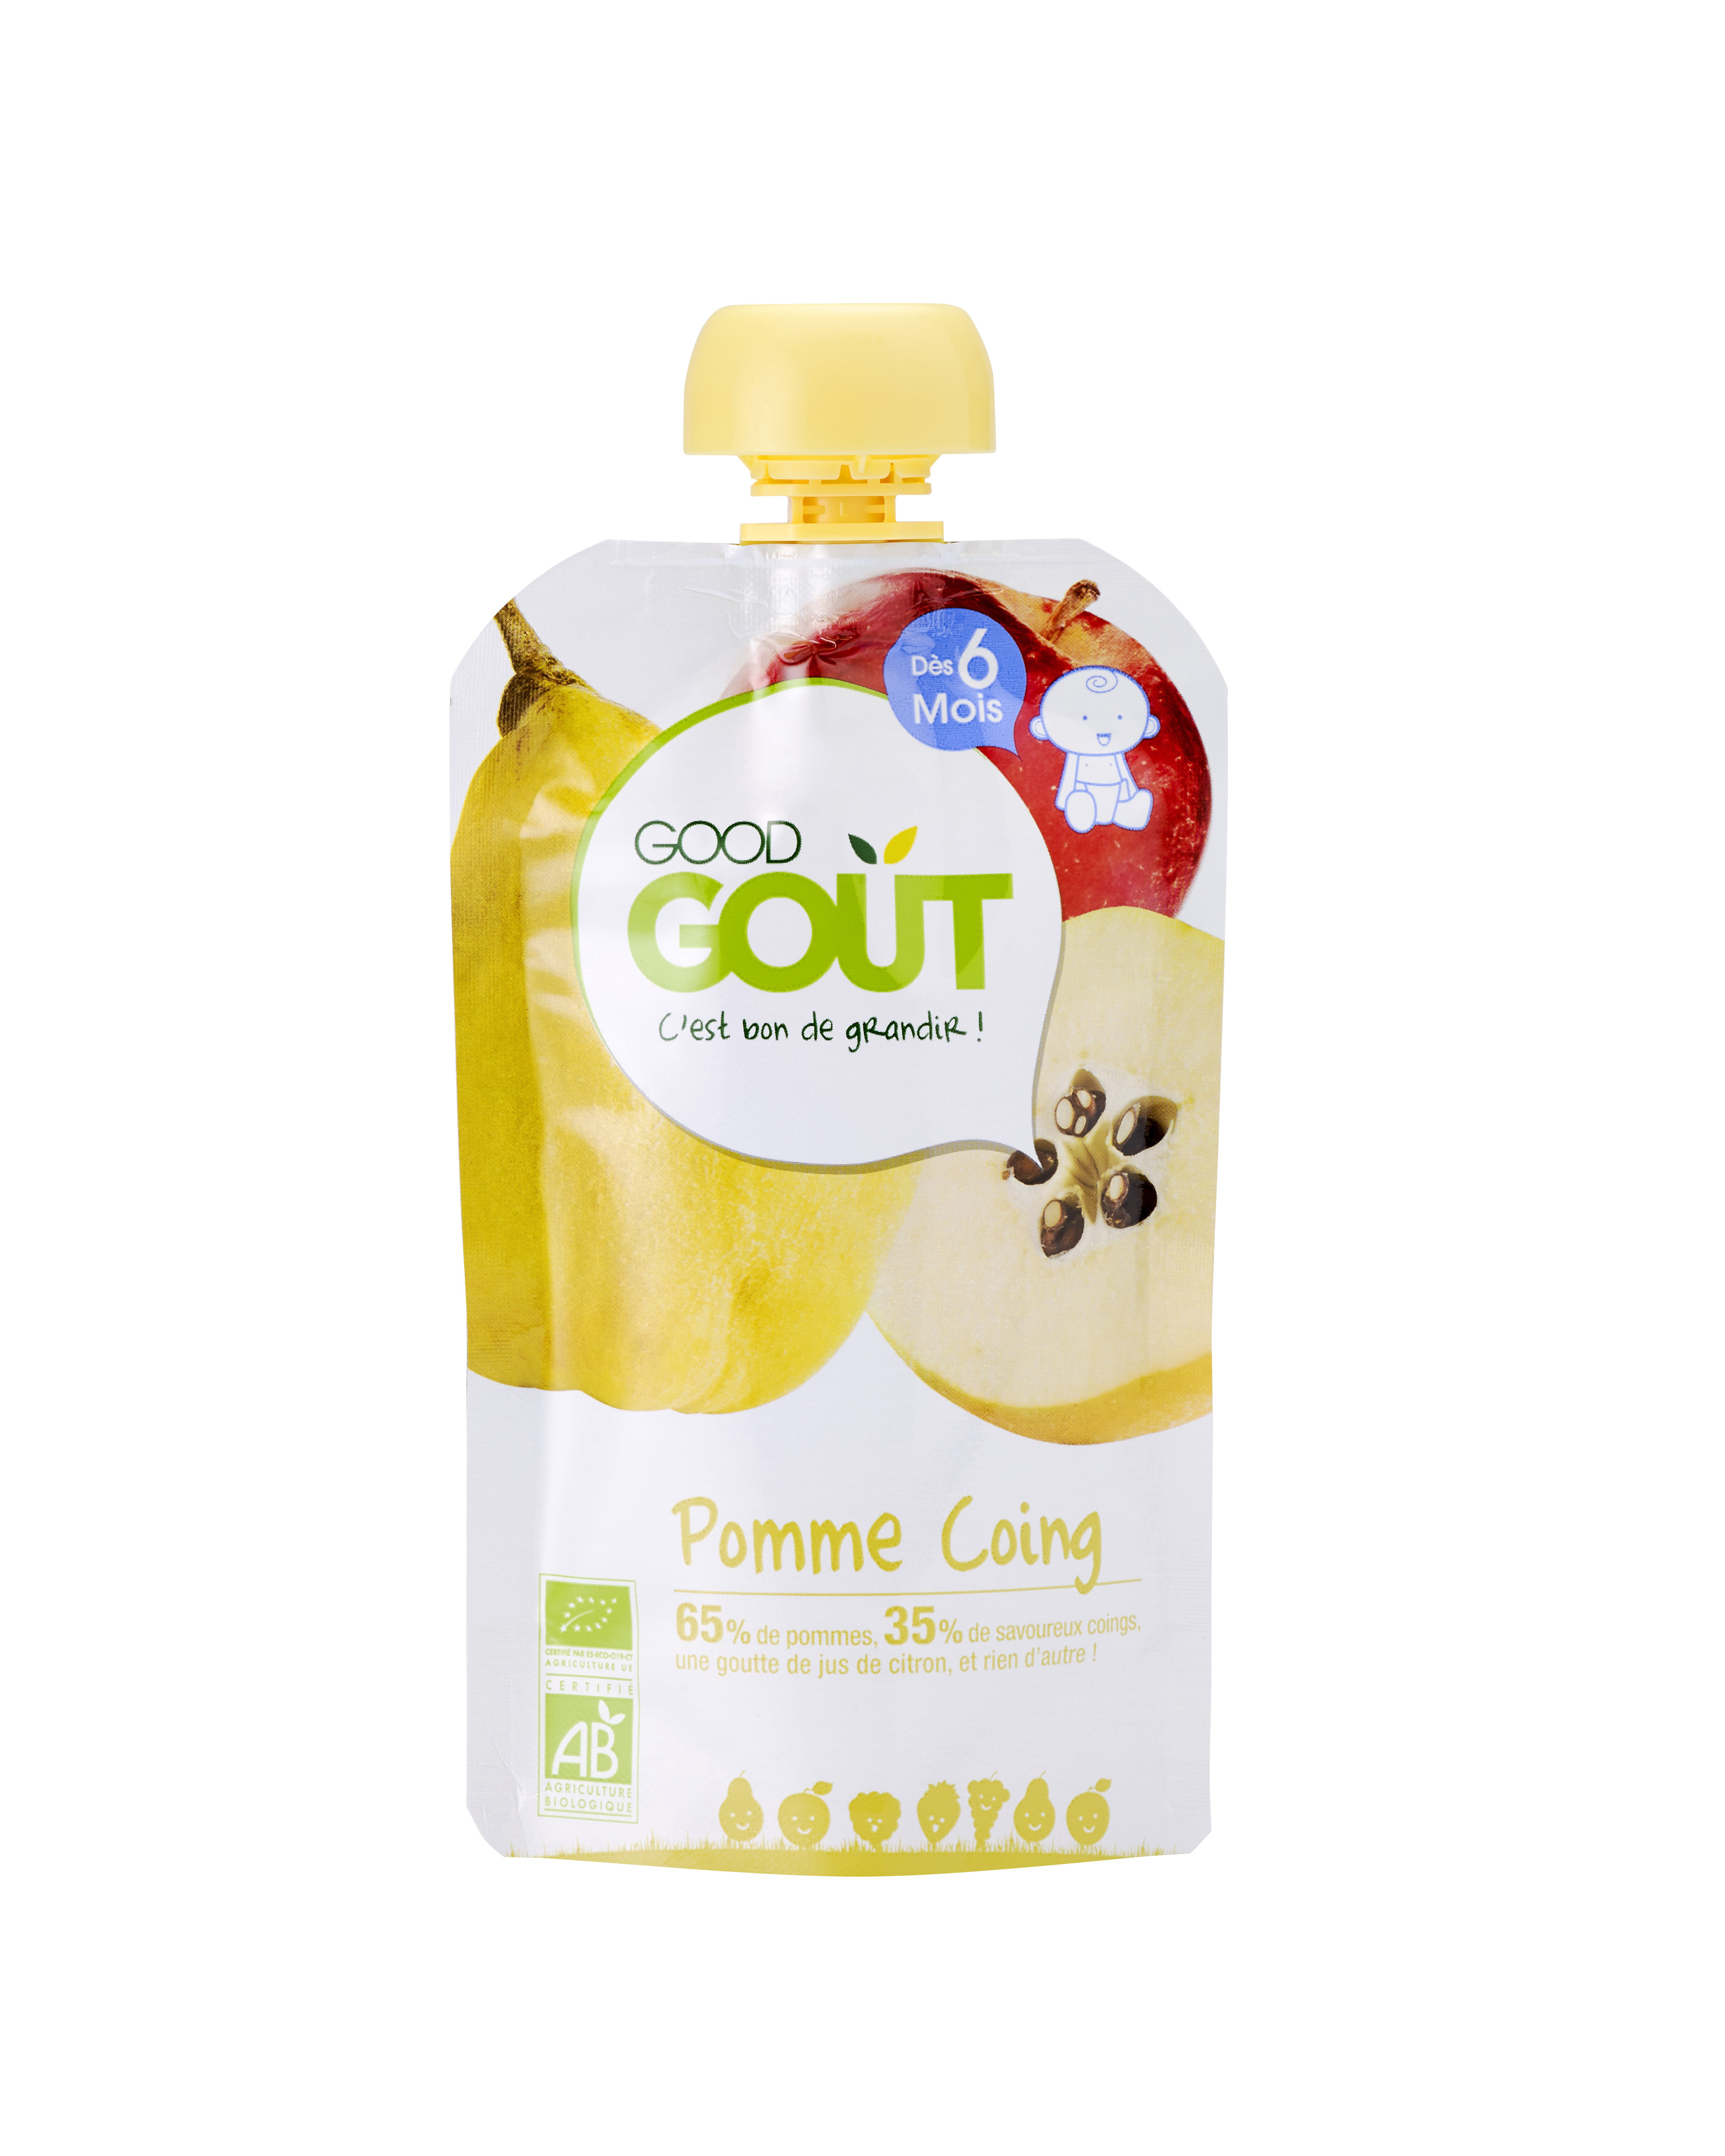 Good Gourde Pomme Coing BIO, Good Goût (120 g) - dès 6 mois